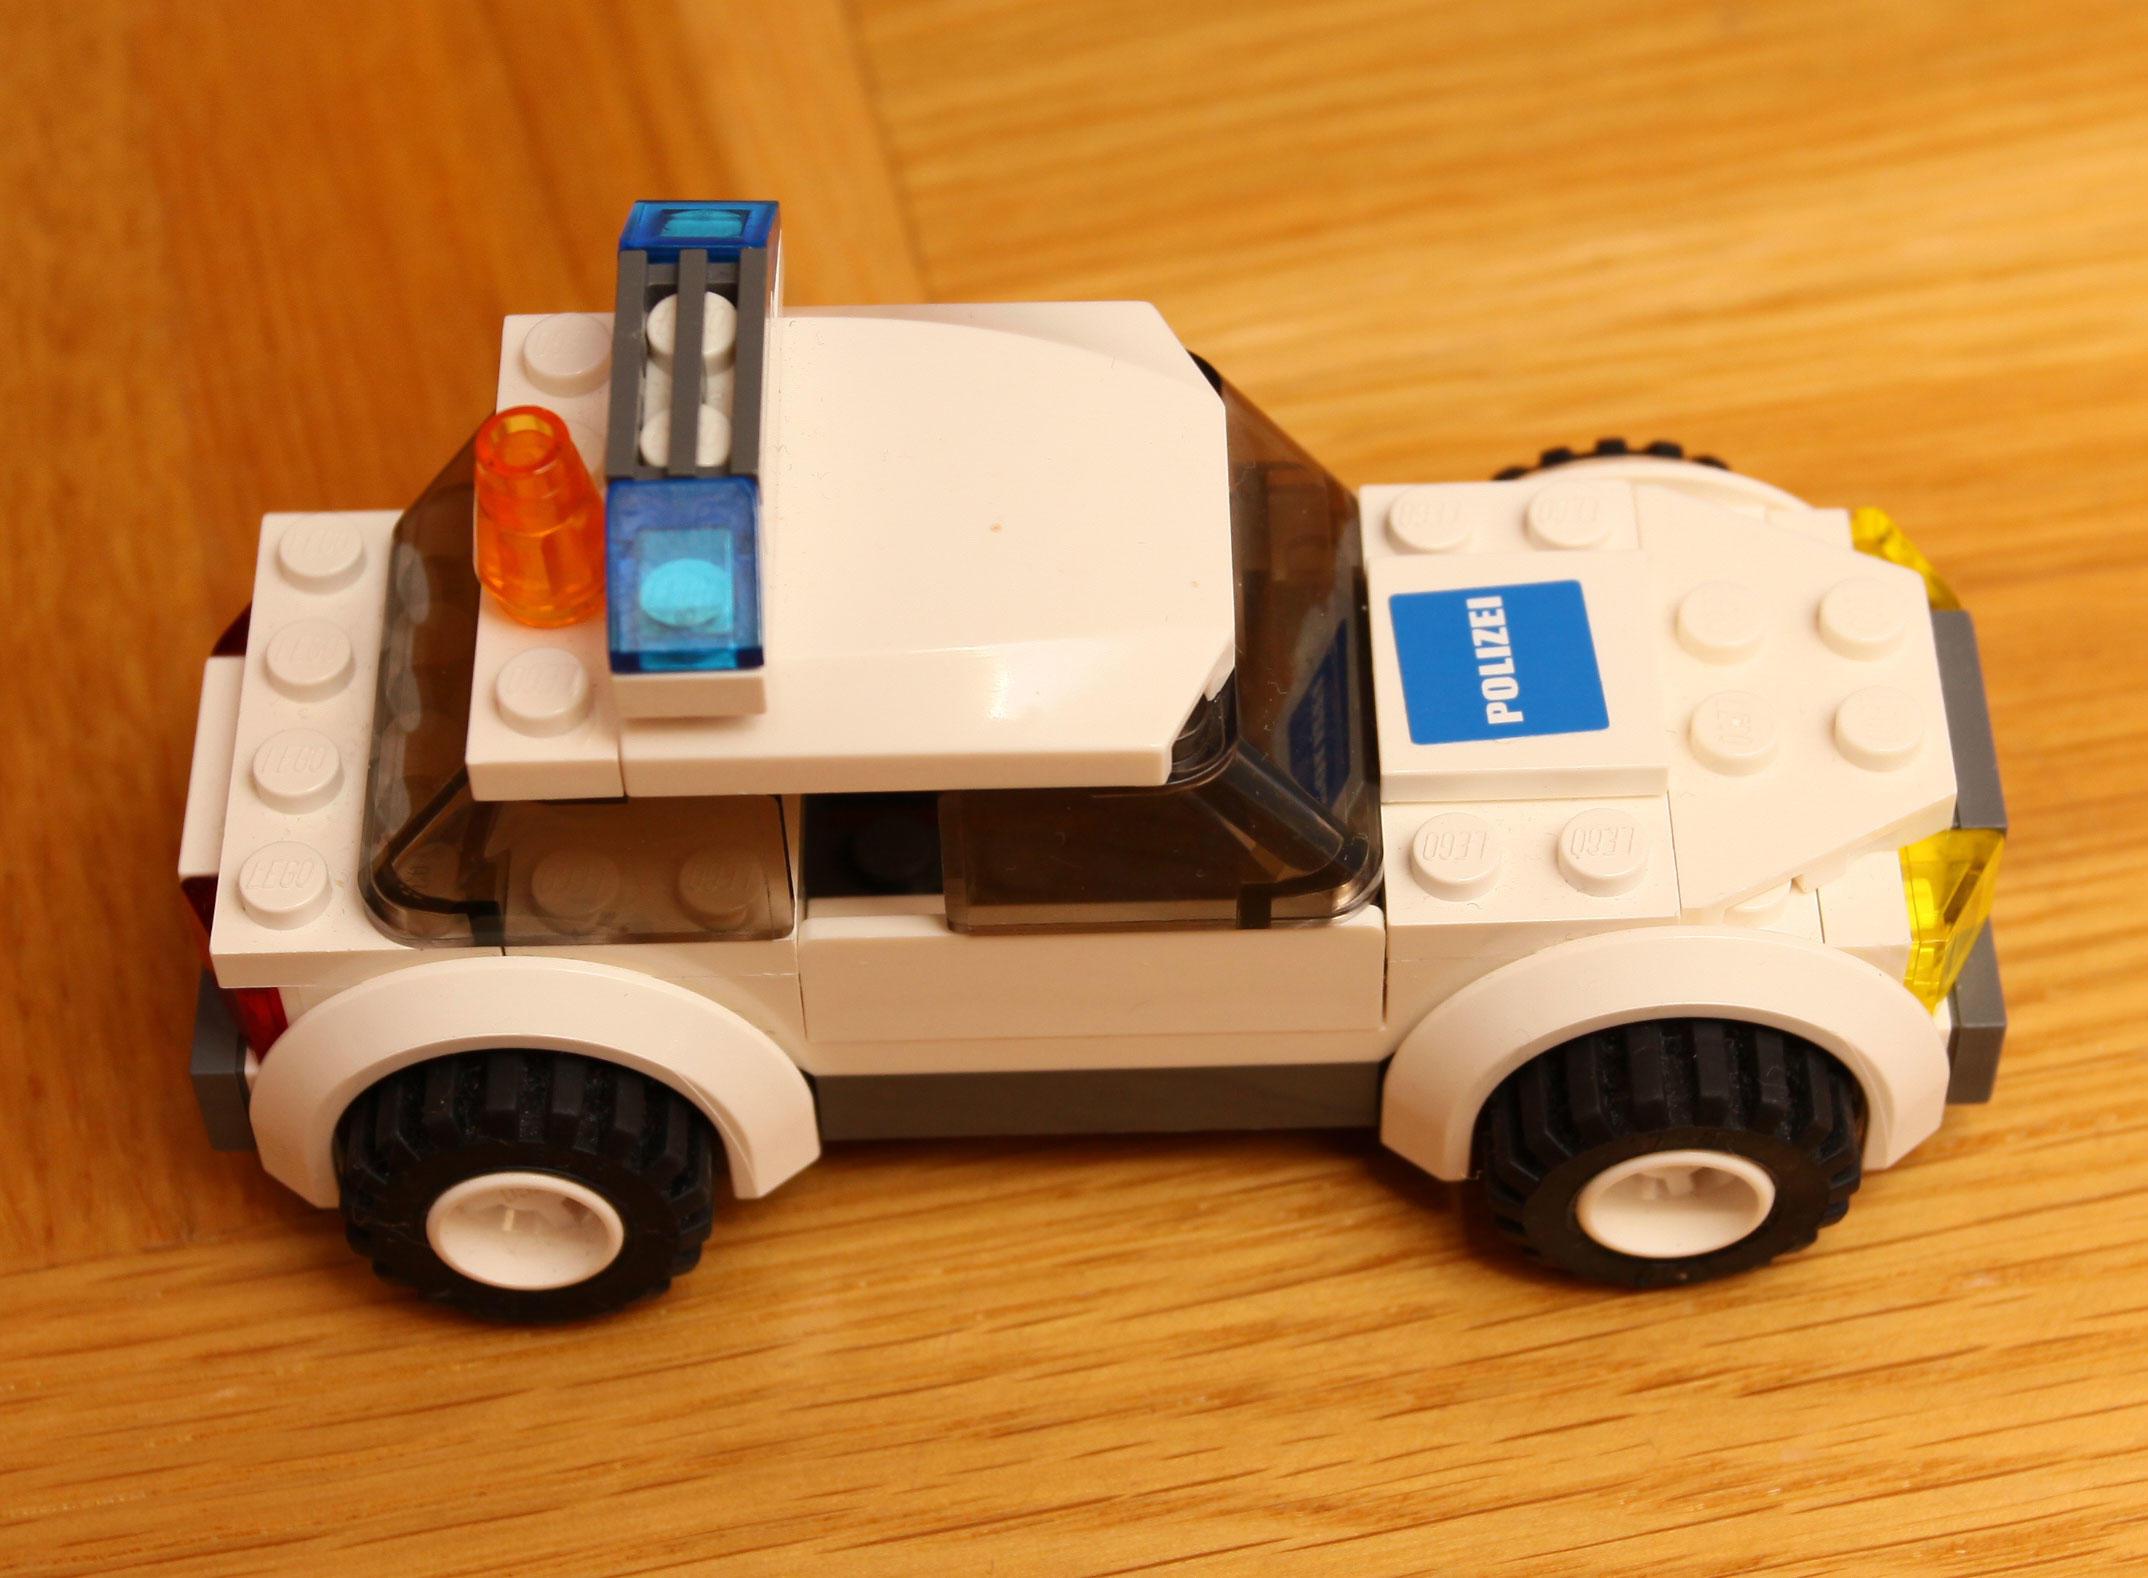 City Police Komenda Policji 7744 Lego Opinie Testy Cena Bangla